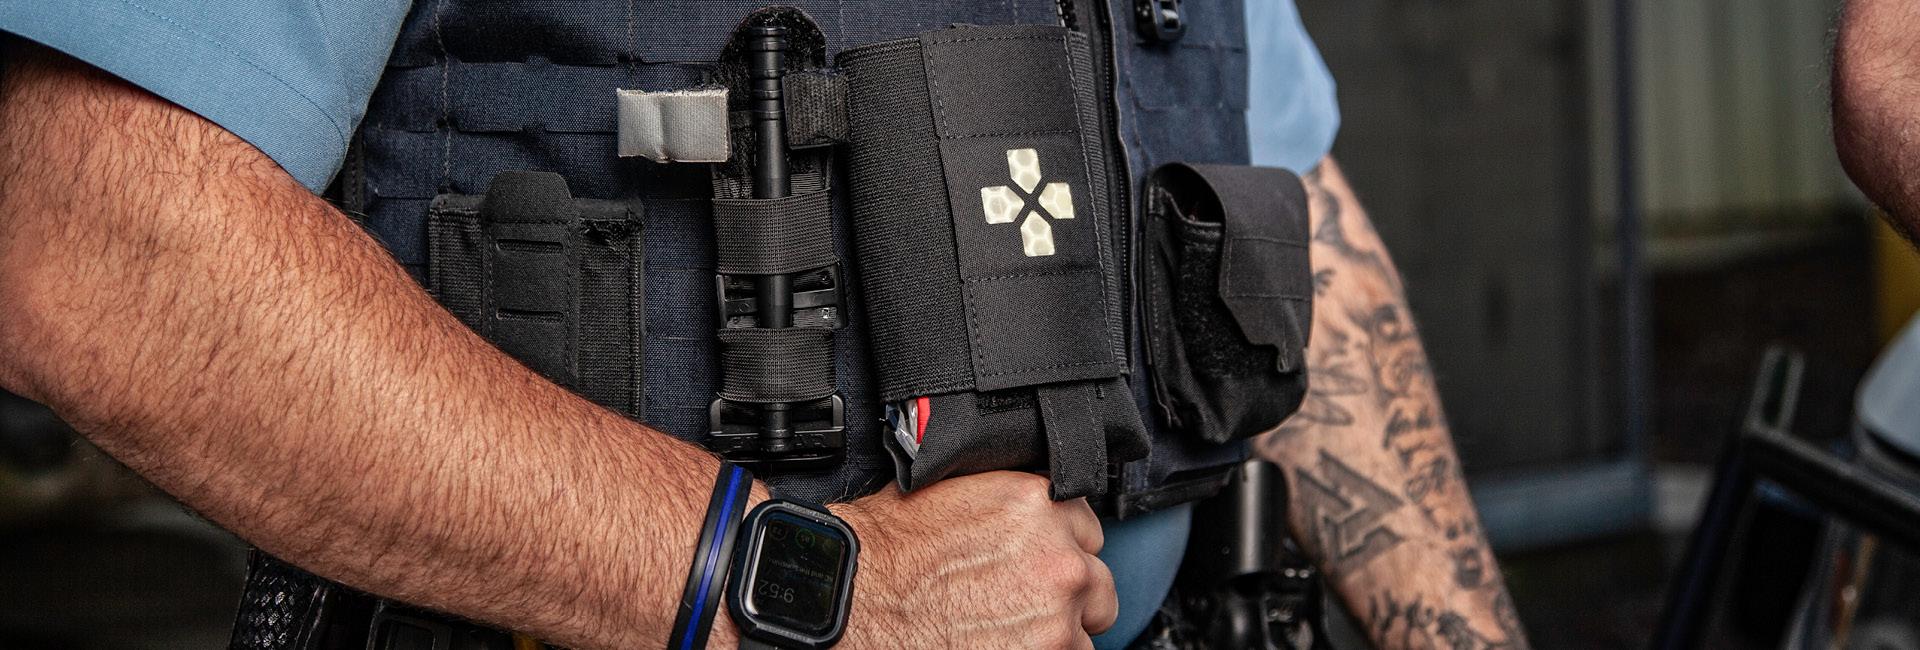 Micro Trauma Kit on a MOLLE Belt